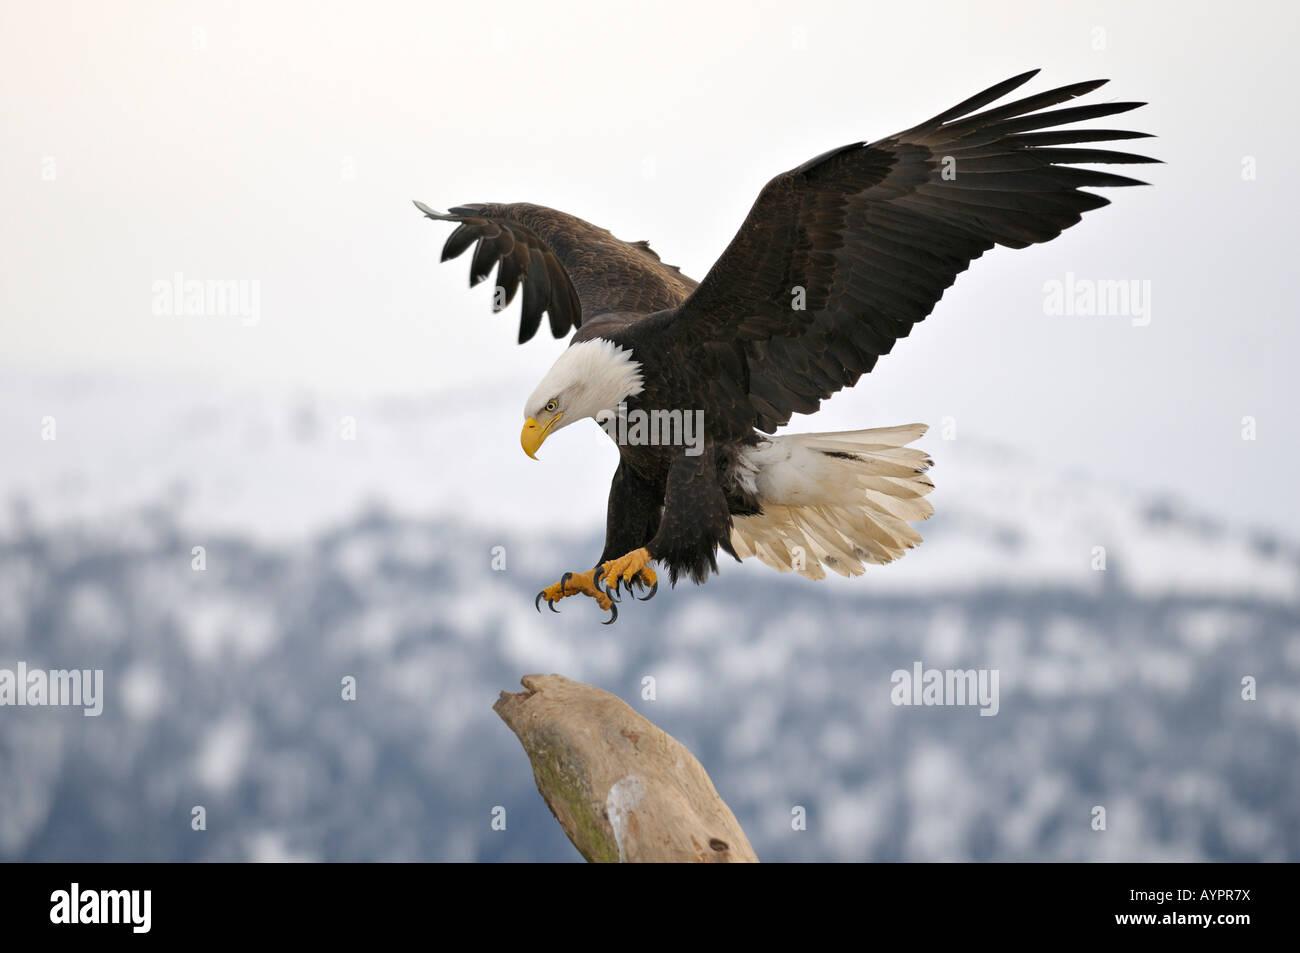 Bald Eagle (Haliaeetus leucocephalus) landing, Kenai Peninsula, Alaska, USA - Stock Image